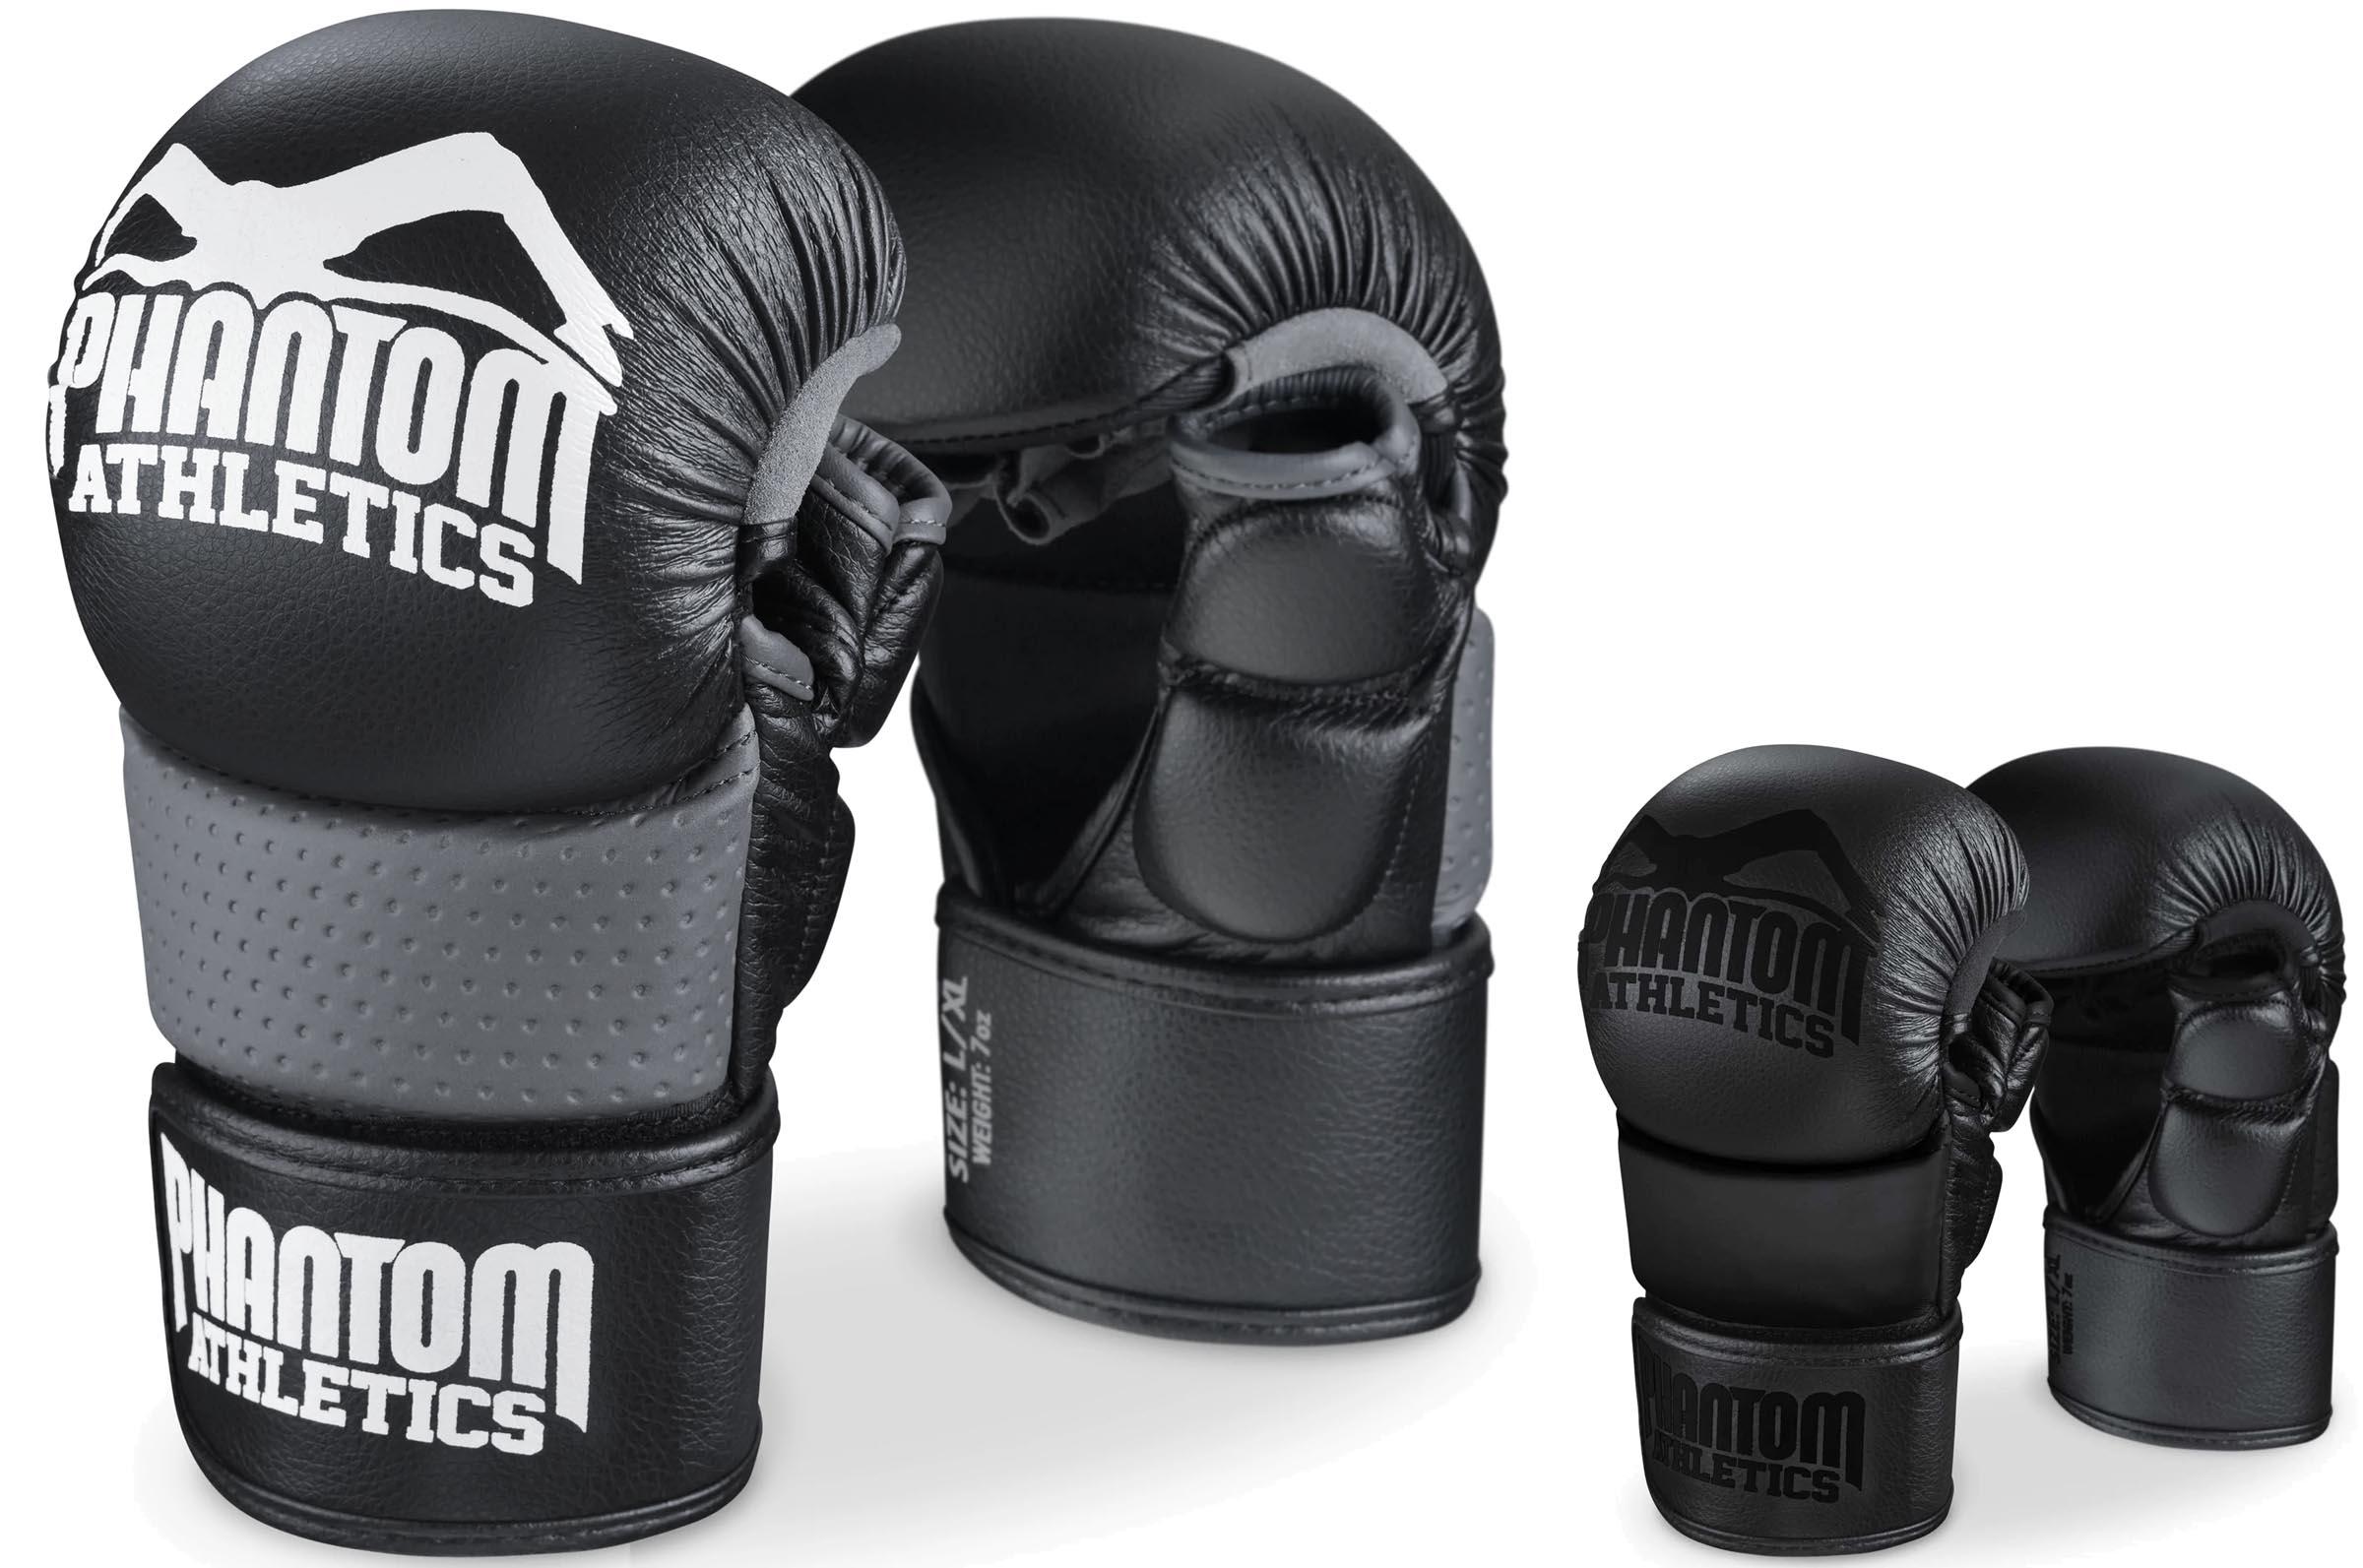 Ringhorns Charger Gants de MMA Sparring Mixte